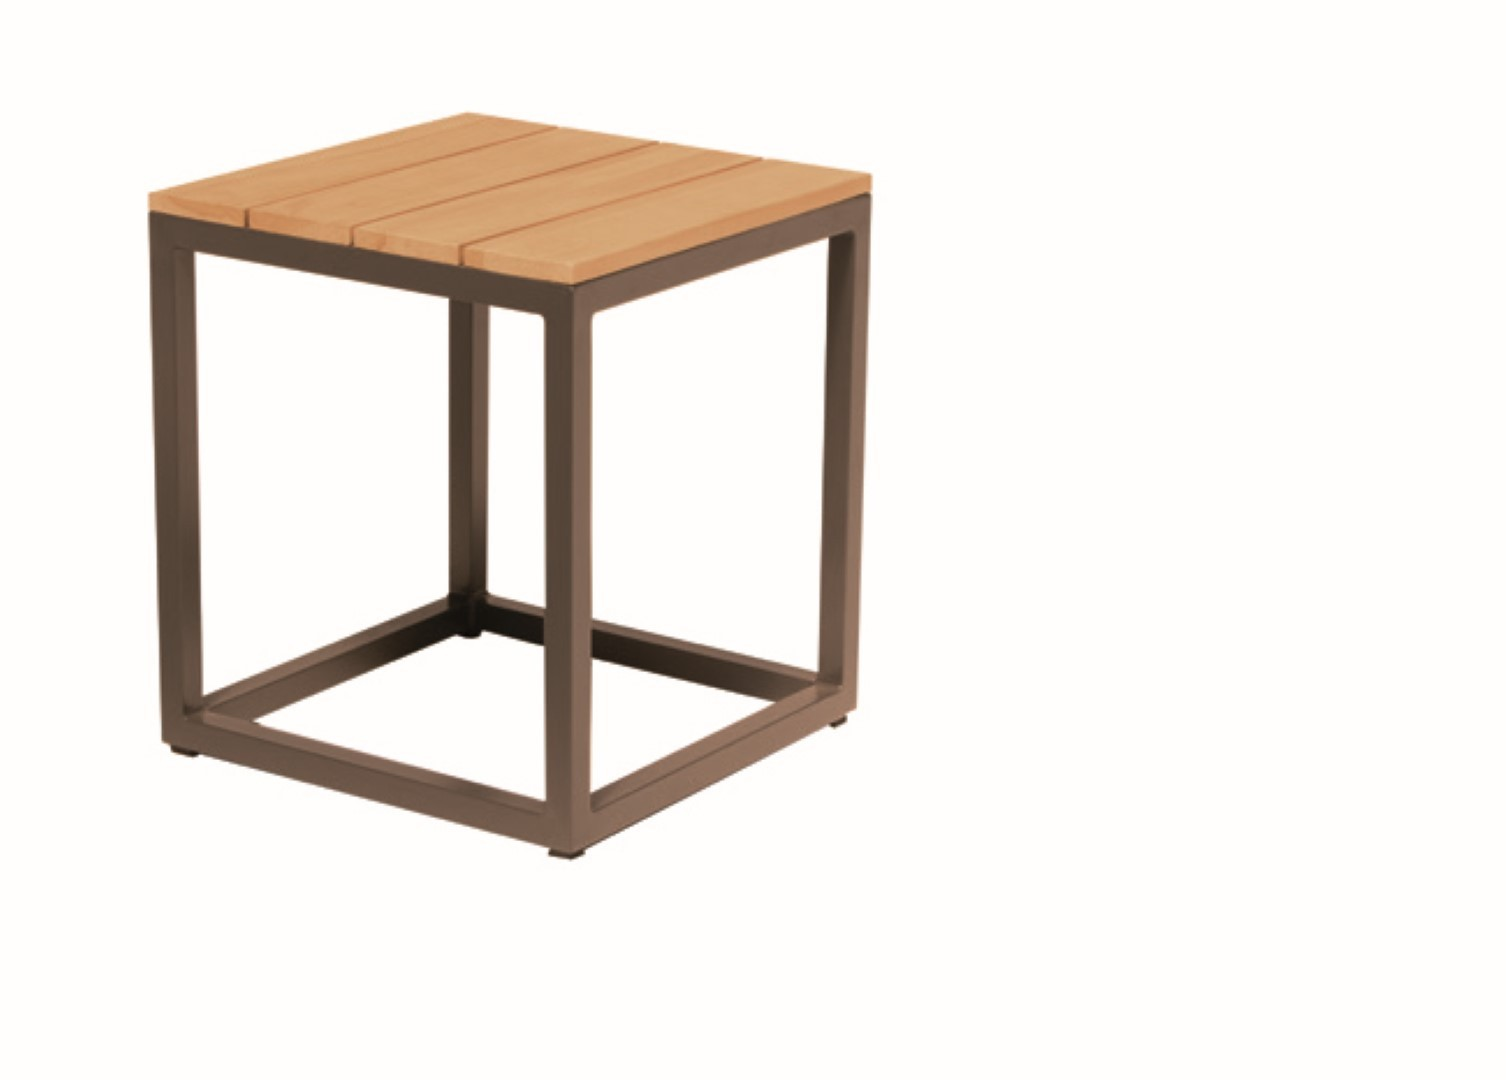 Rio Square Coffee Table Teak Top Rio S 40 x 40 cm